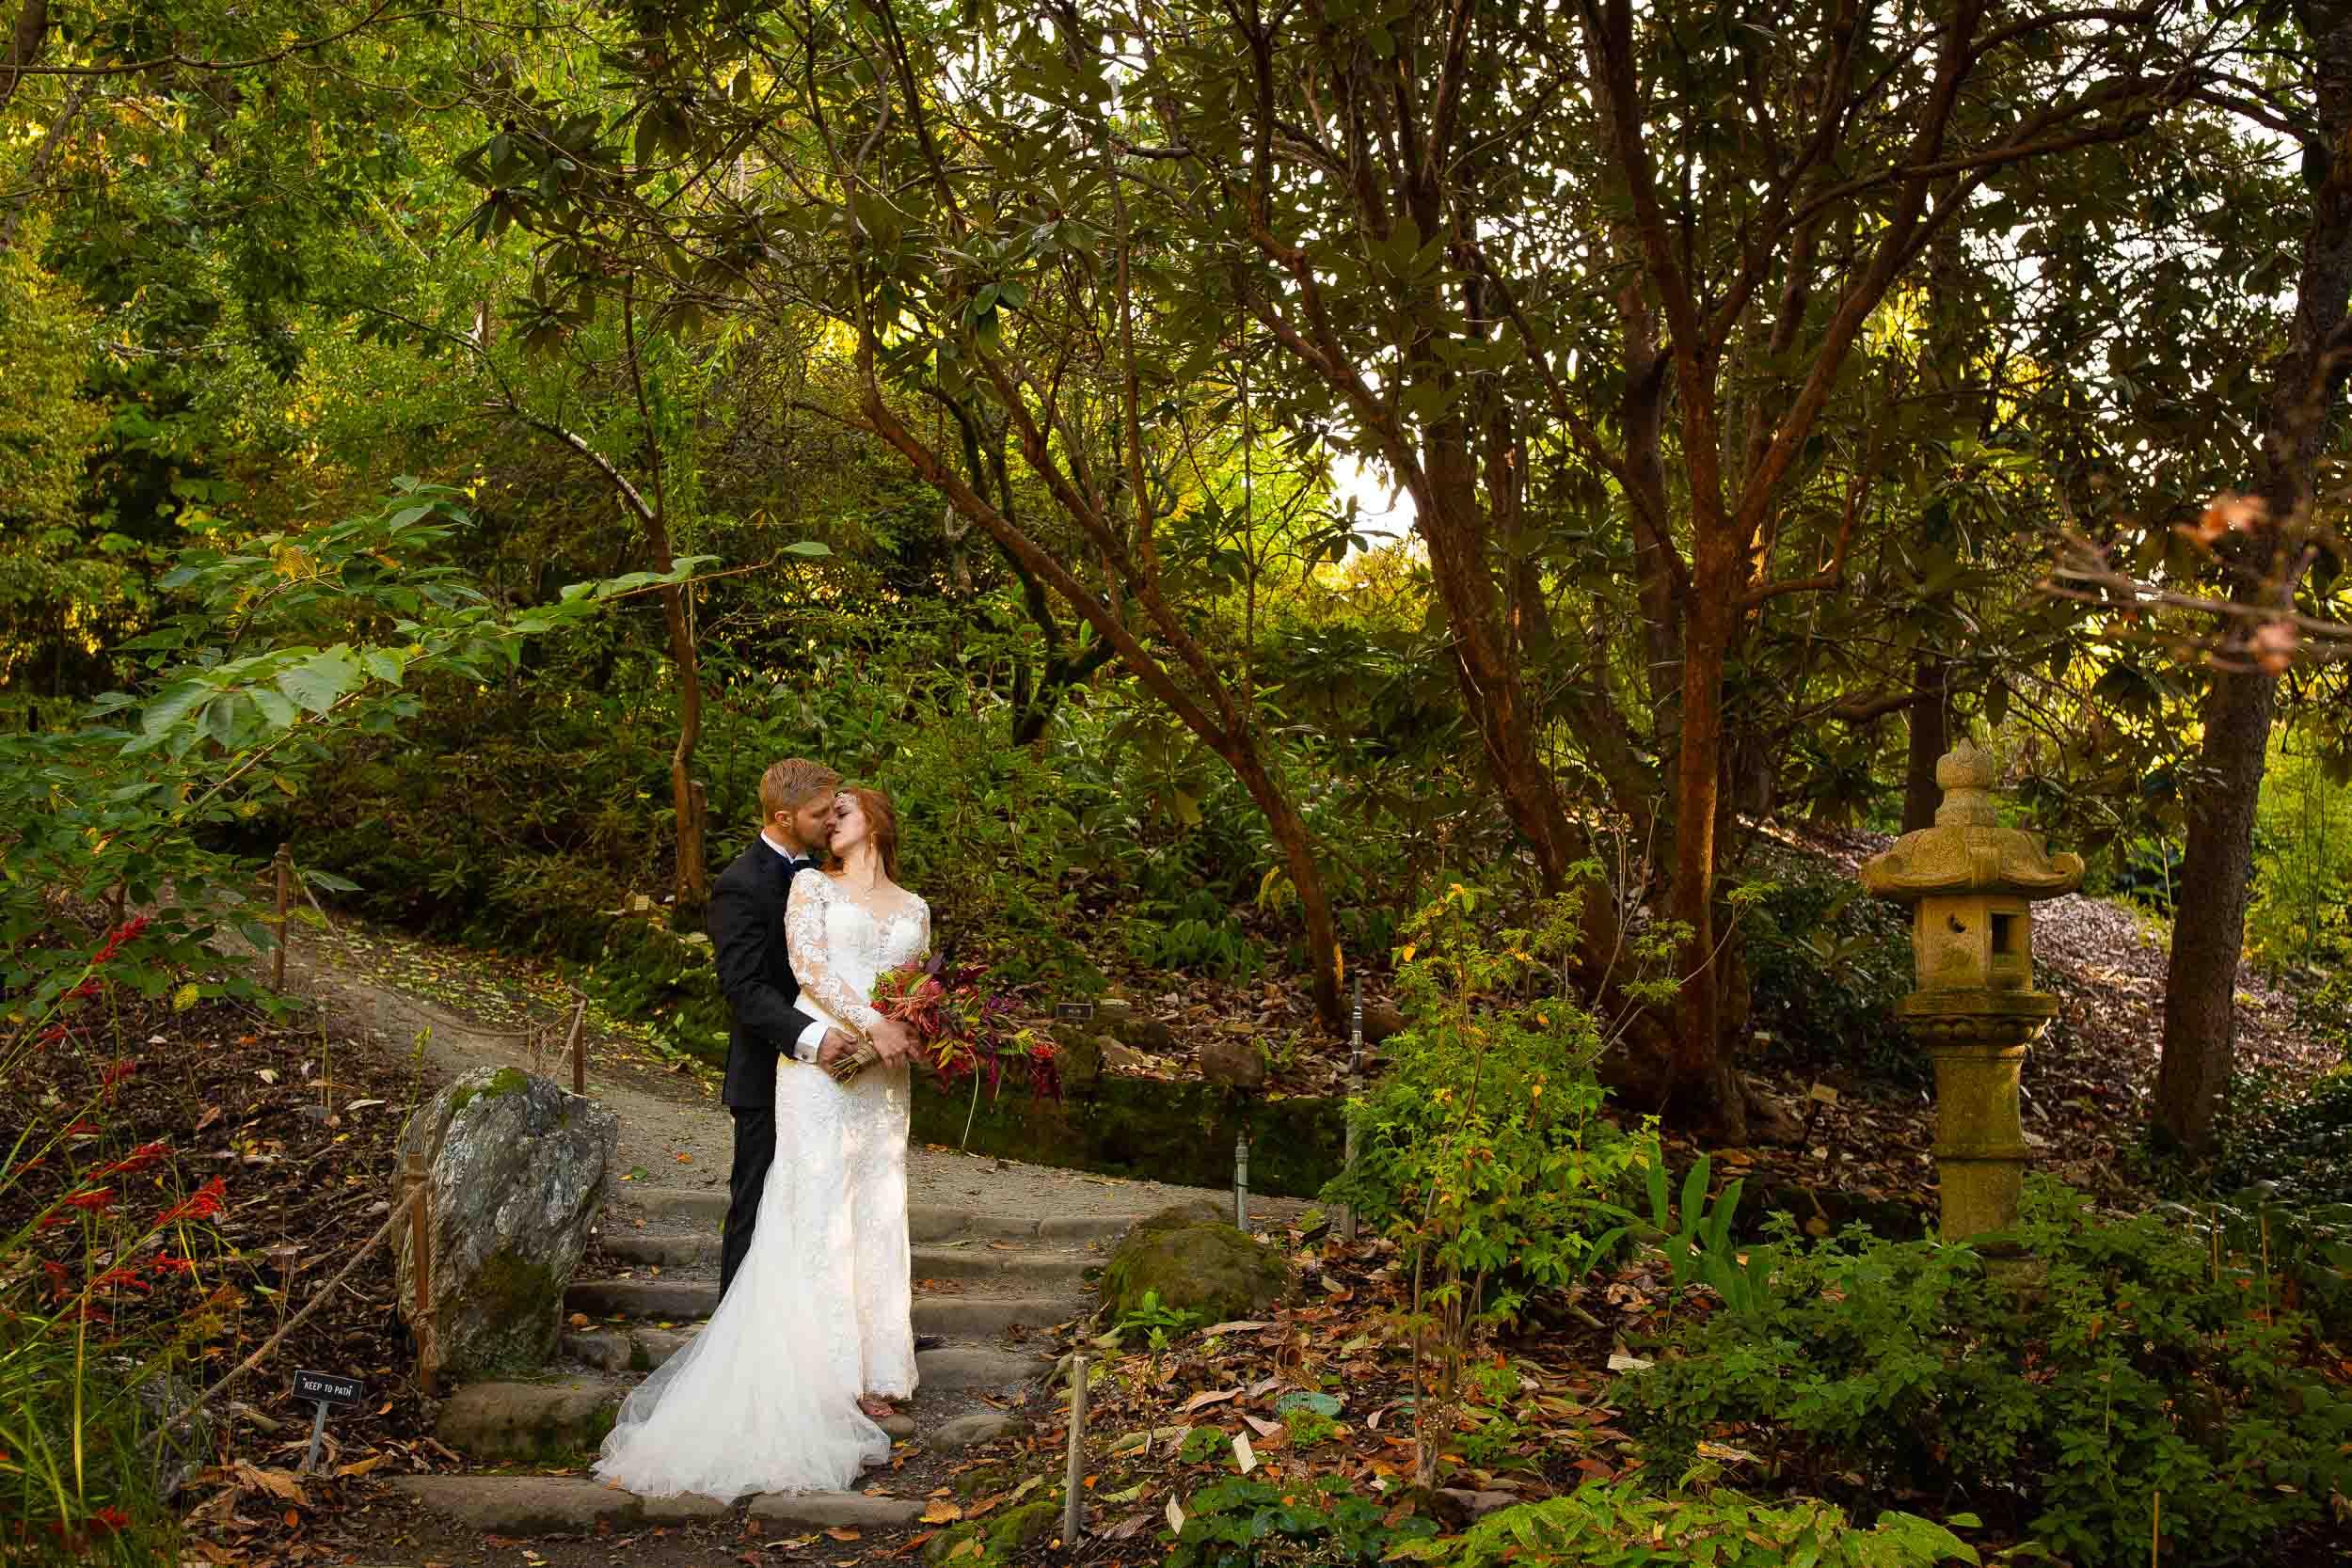 Berkeley Botanical Garden Wedding Ceremony in the Redwood Grove Ceremony and SF Bay Wedding Cruise Reception-56.jpg